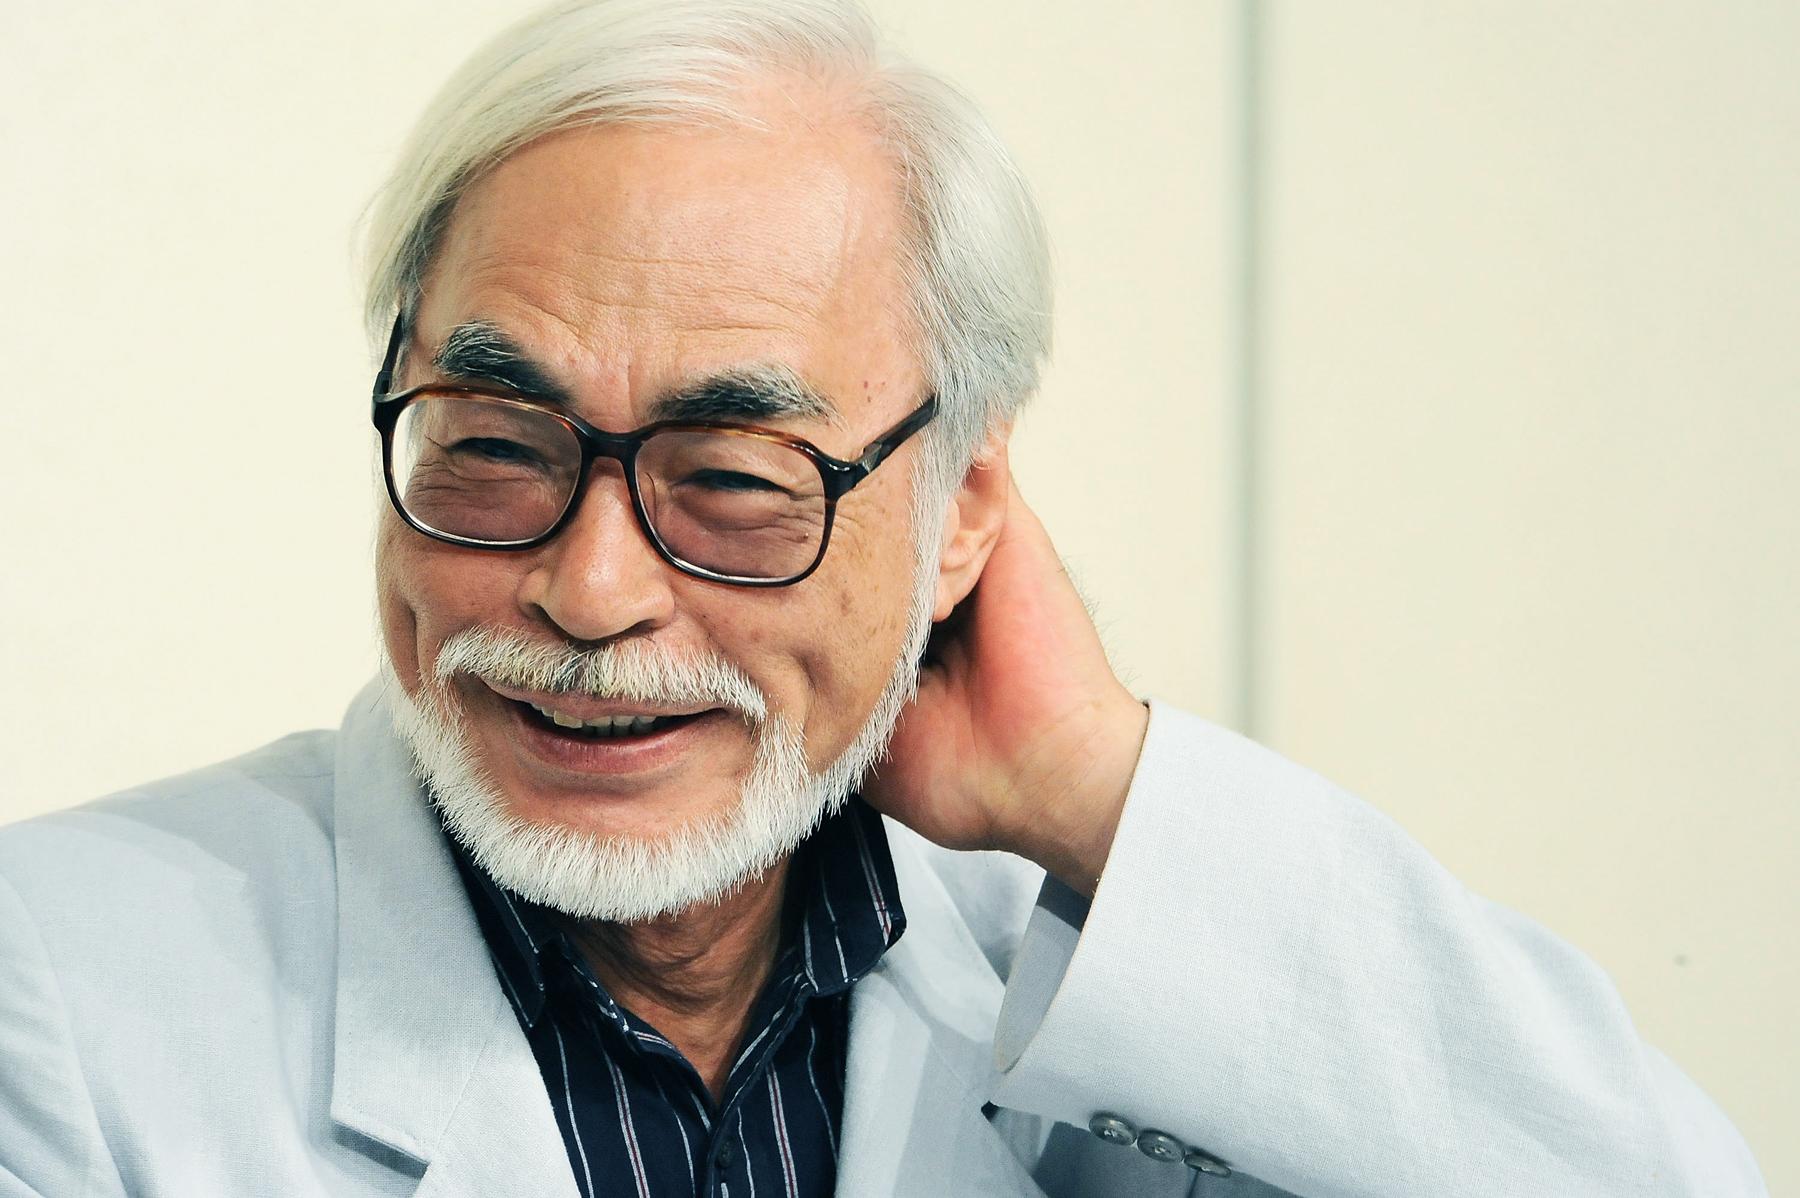 High Resolution Wallpaper | Hayao Miyazaki 1800x1198 px